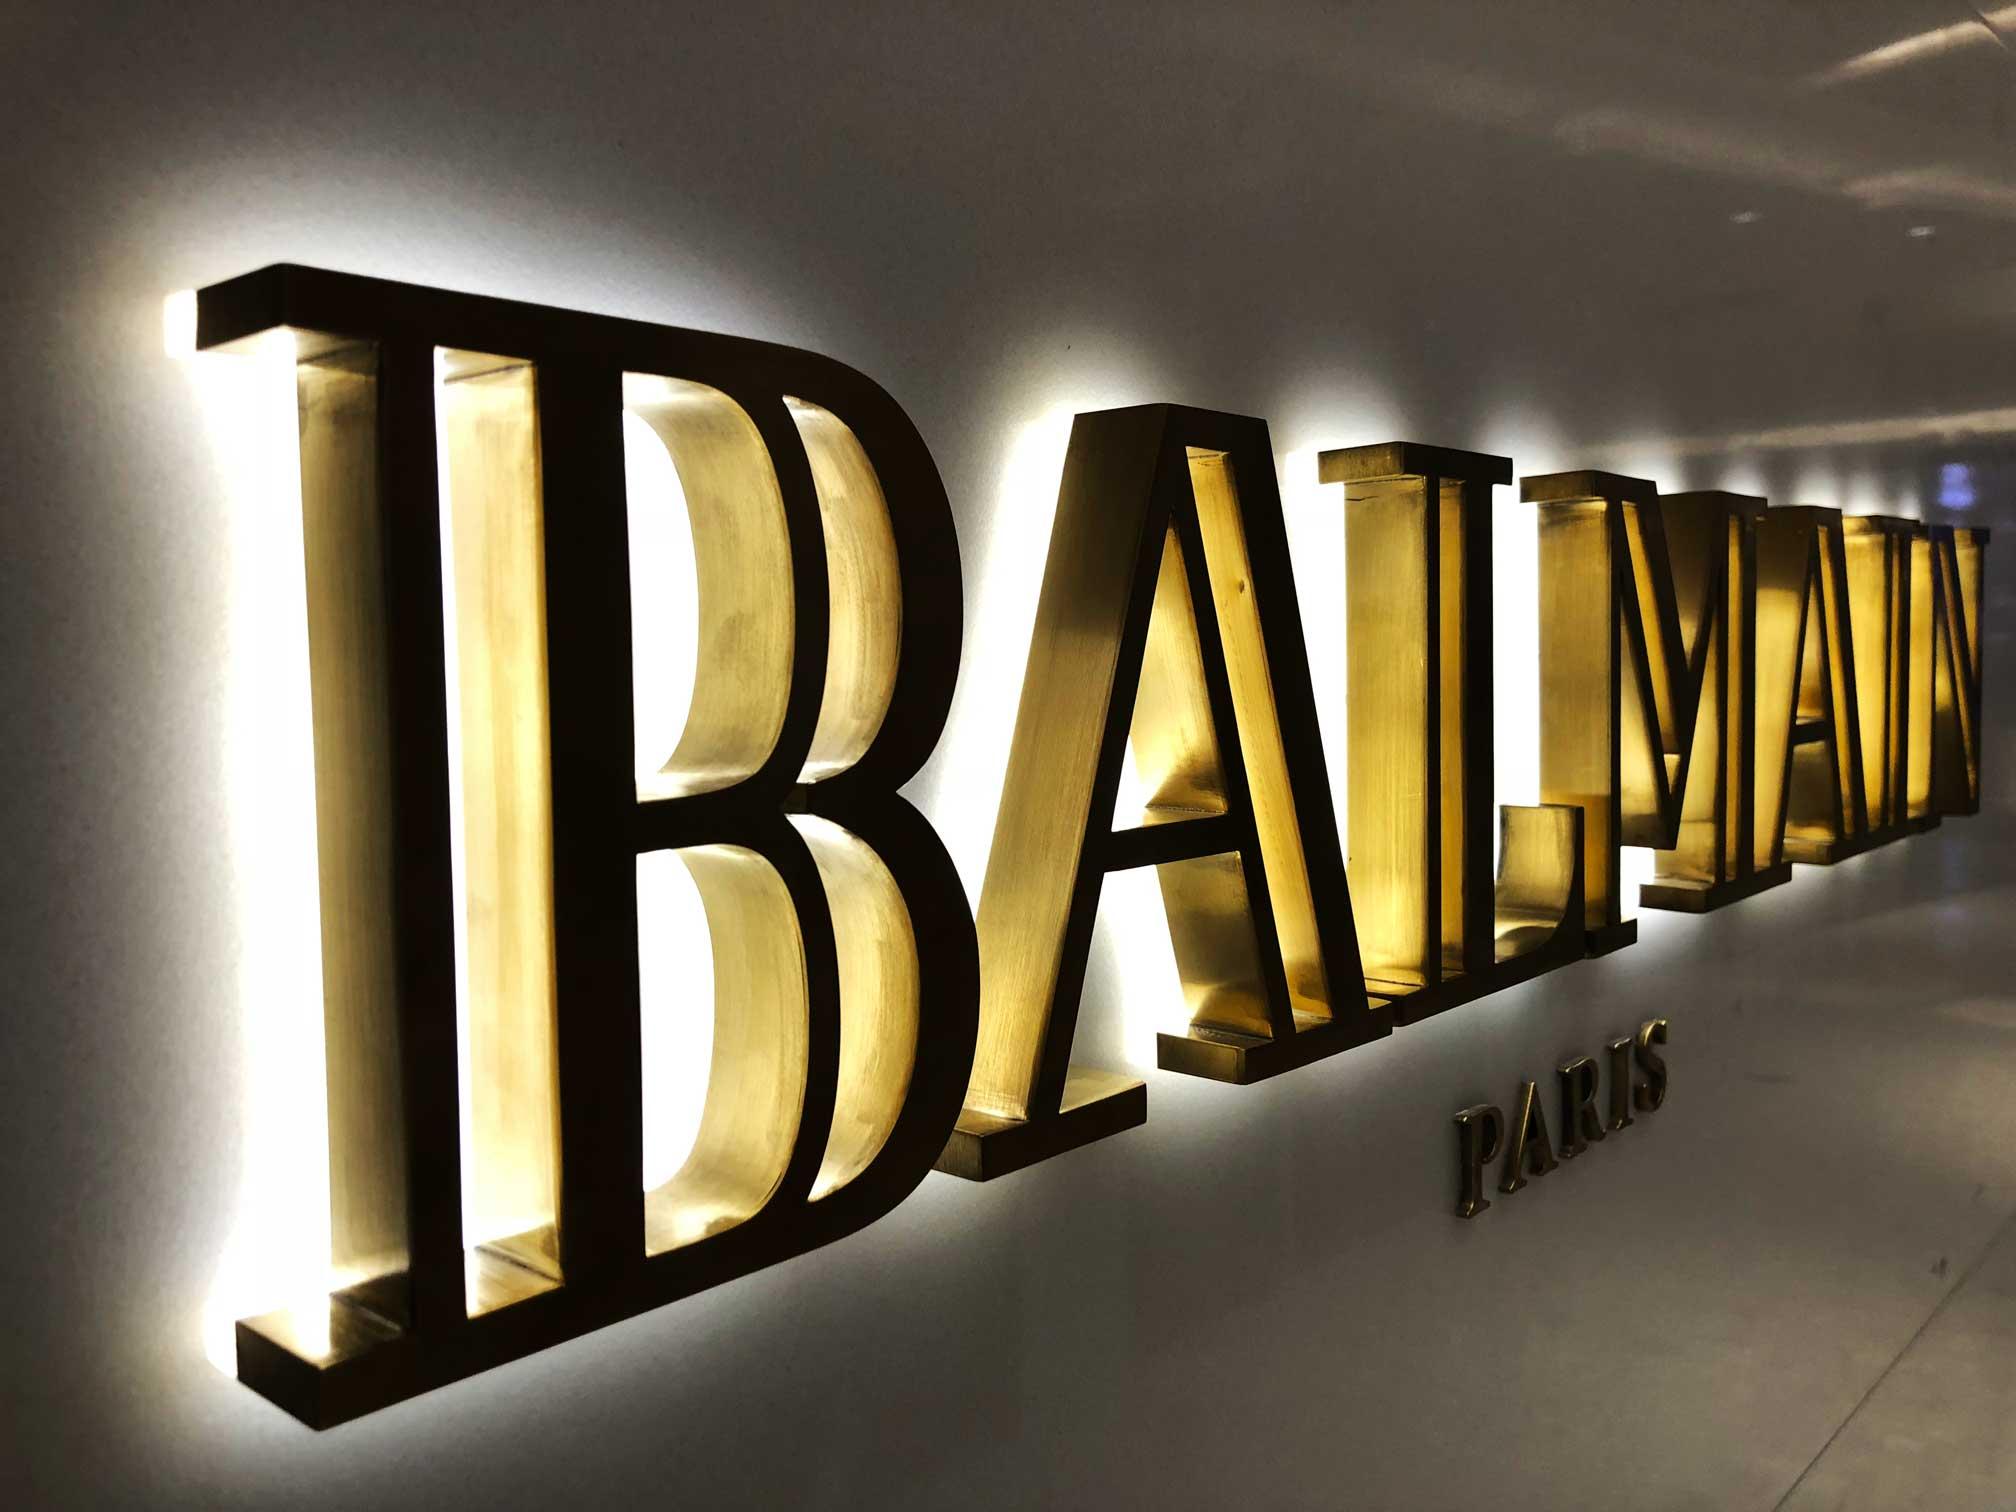 Fashion brand illuminated sign